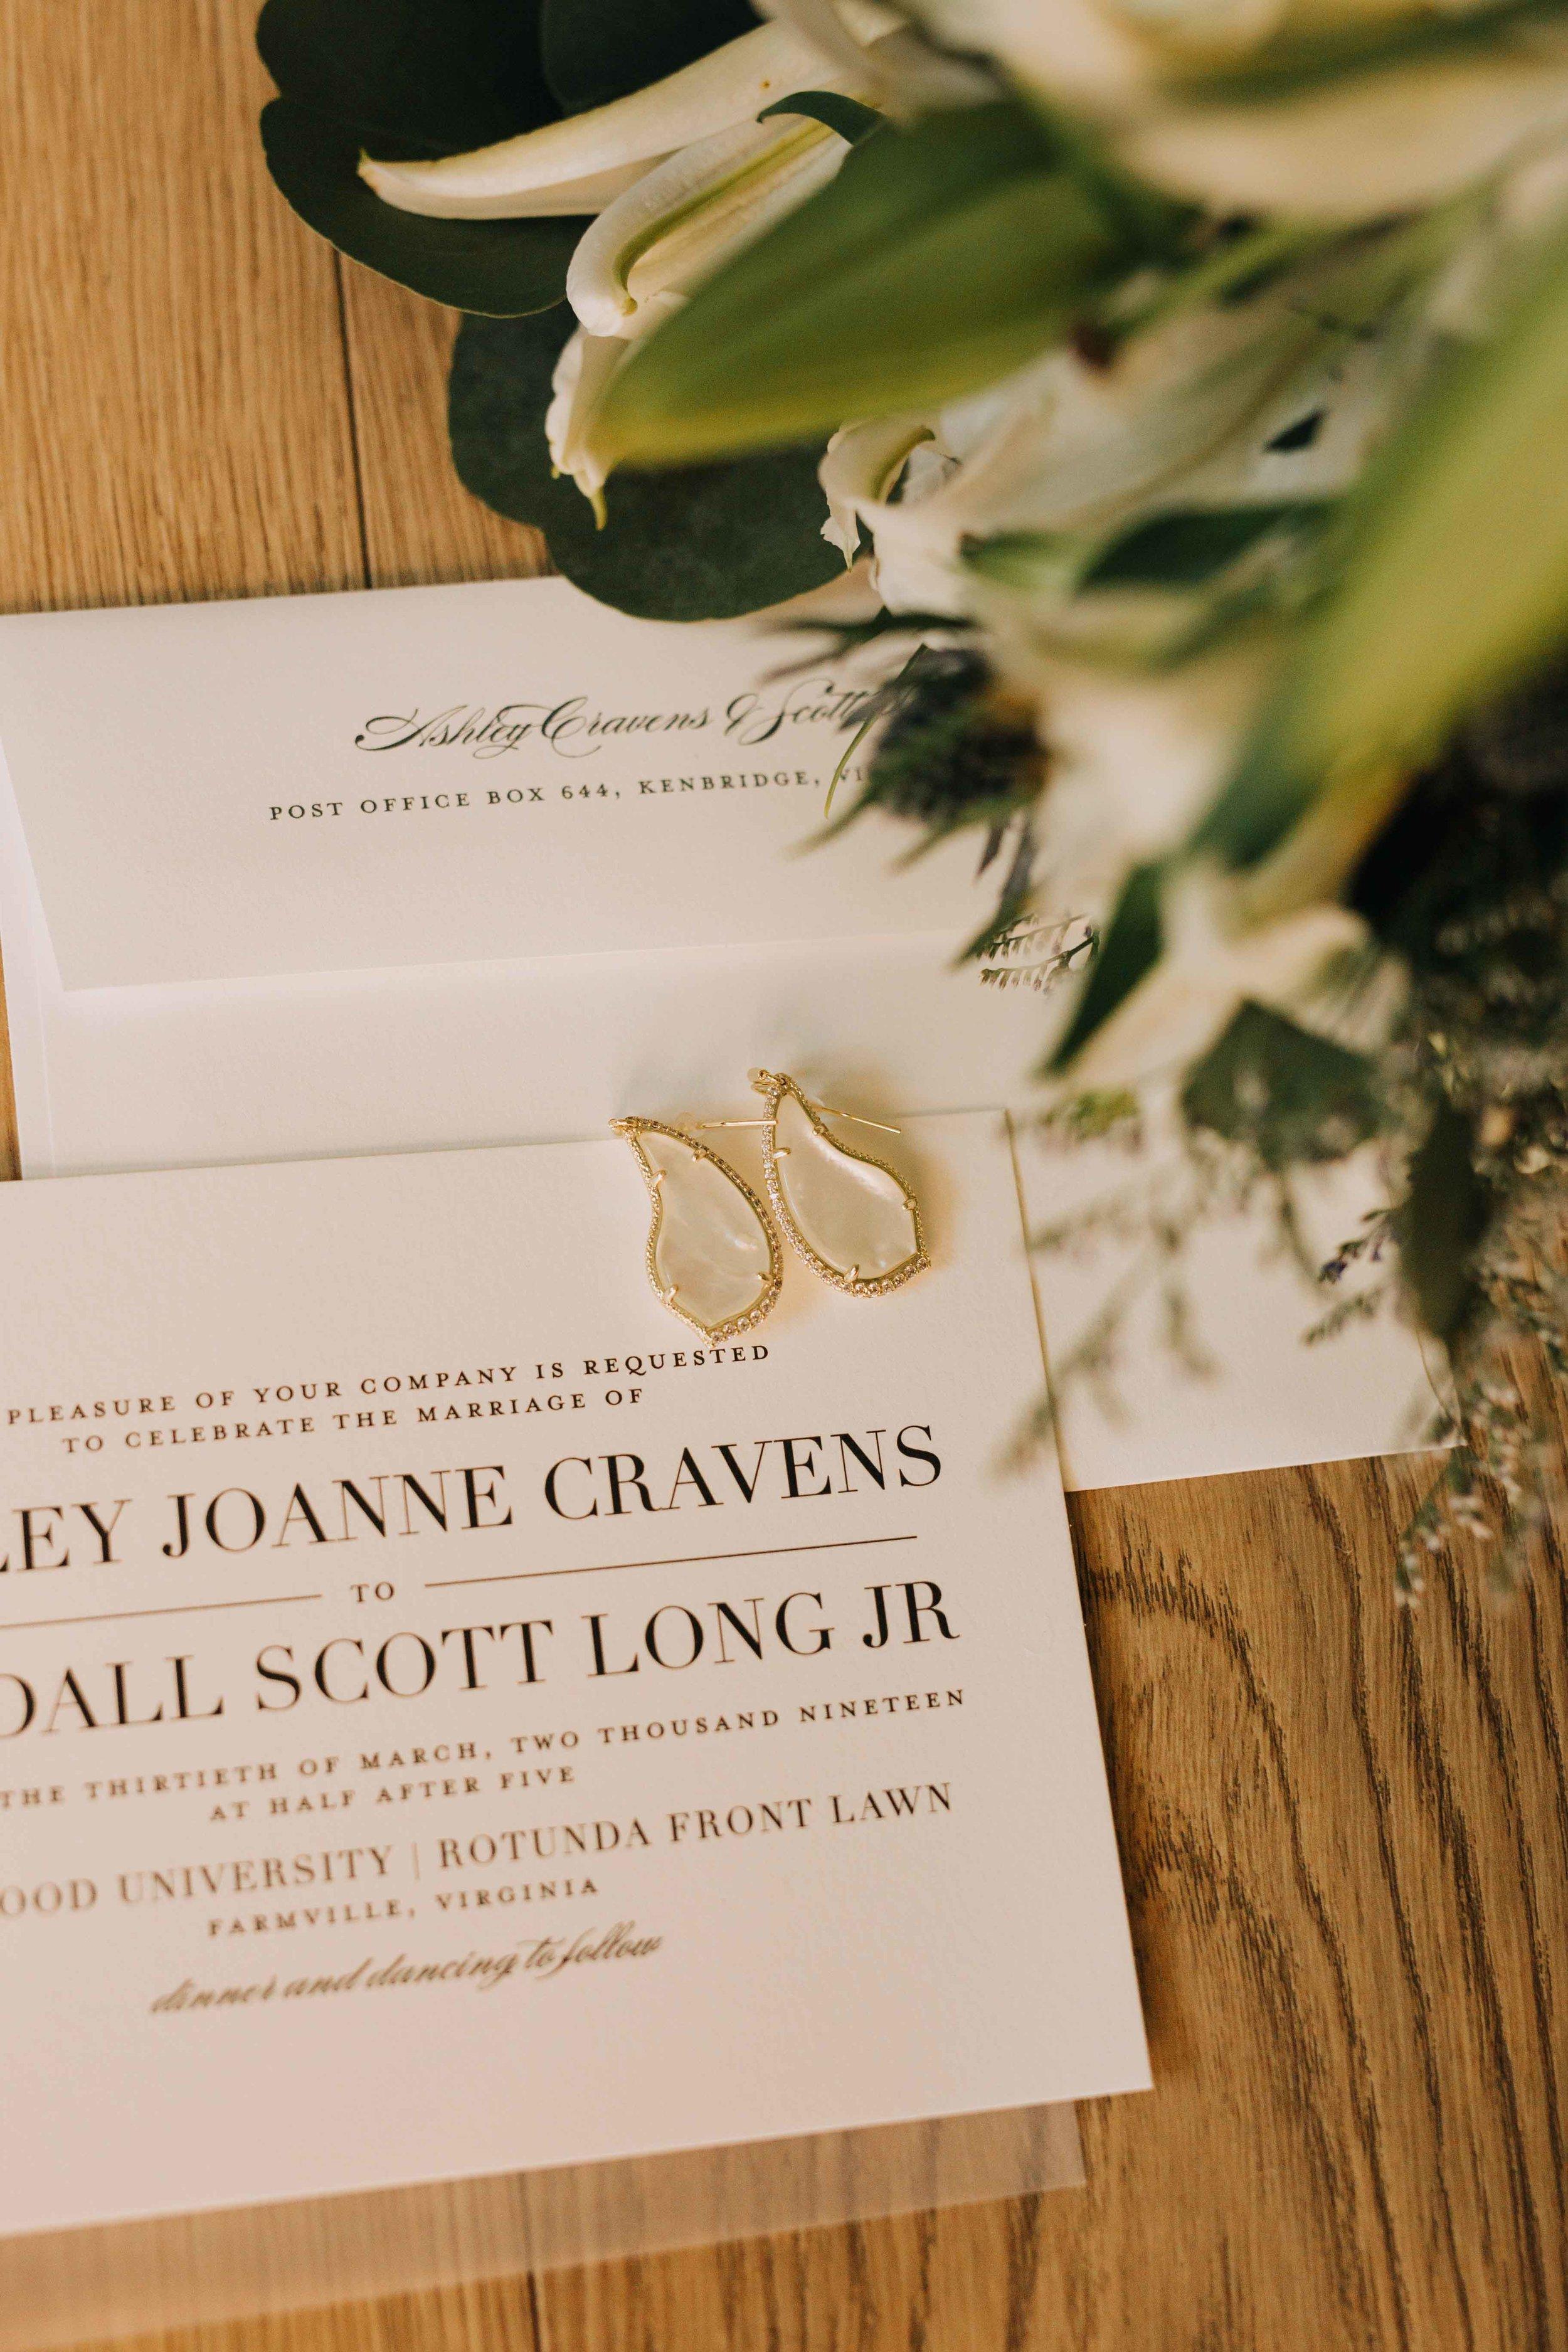 Farmville-Virginia-Wedding-Hotel-Weynoke-Downtown-Jacqueline-Waters-Photography-Detailed- (51).jpg